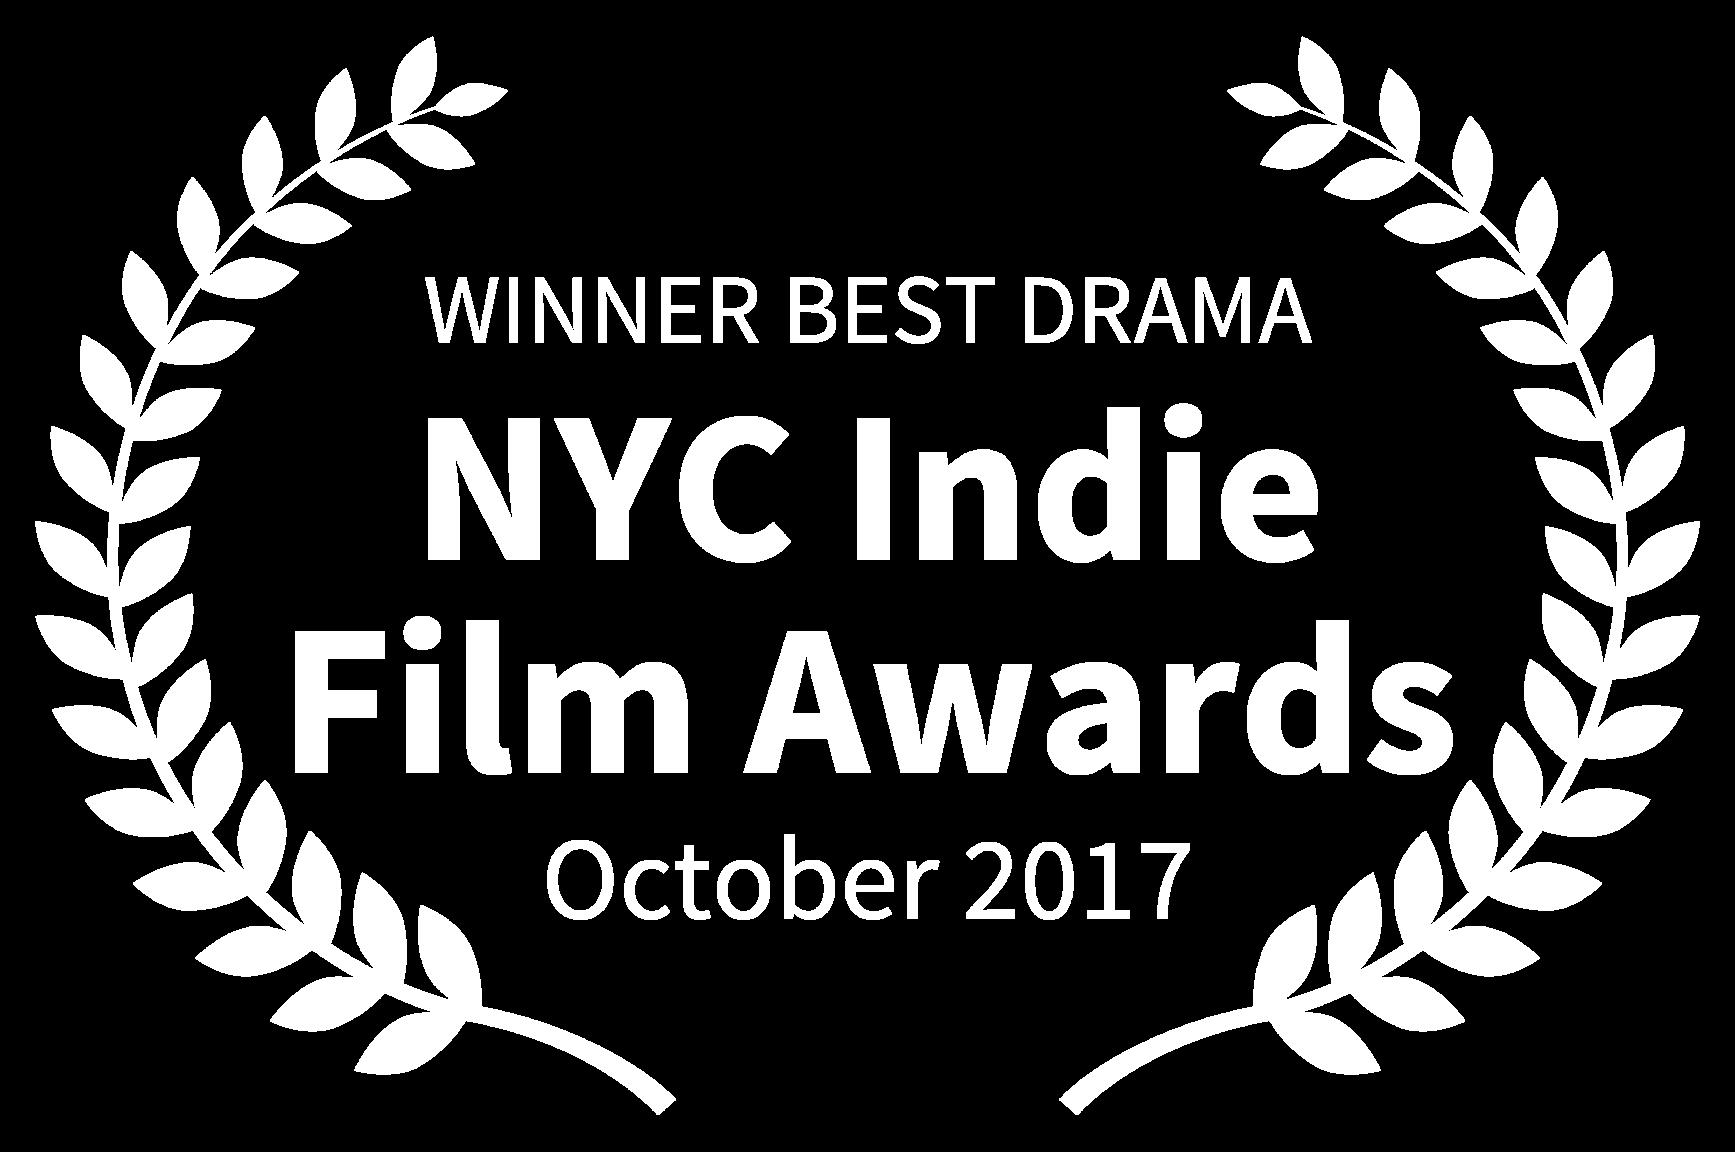 WINNER BEST DRAMA - NYC Indie Film Awards - October 2017.png